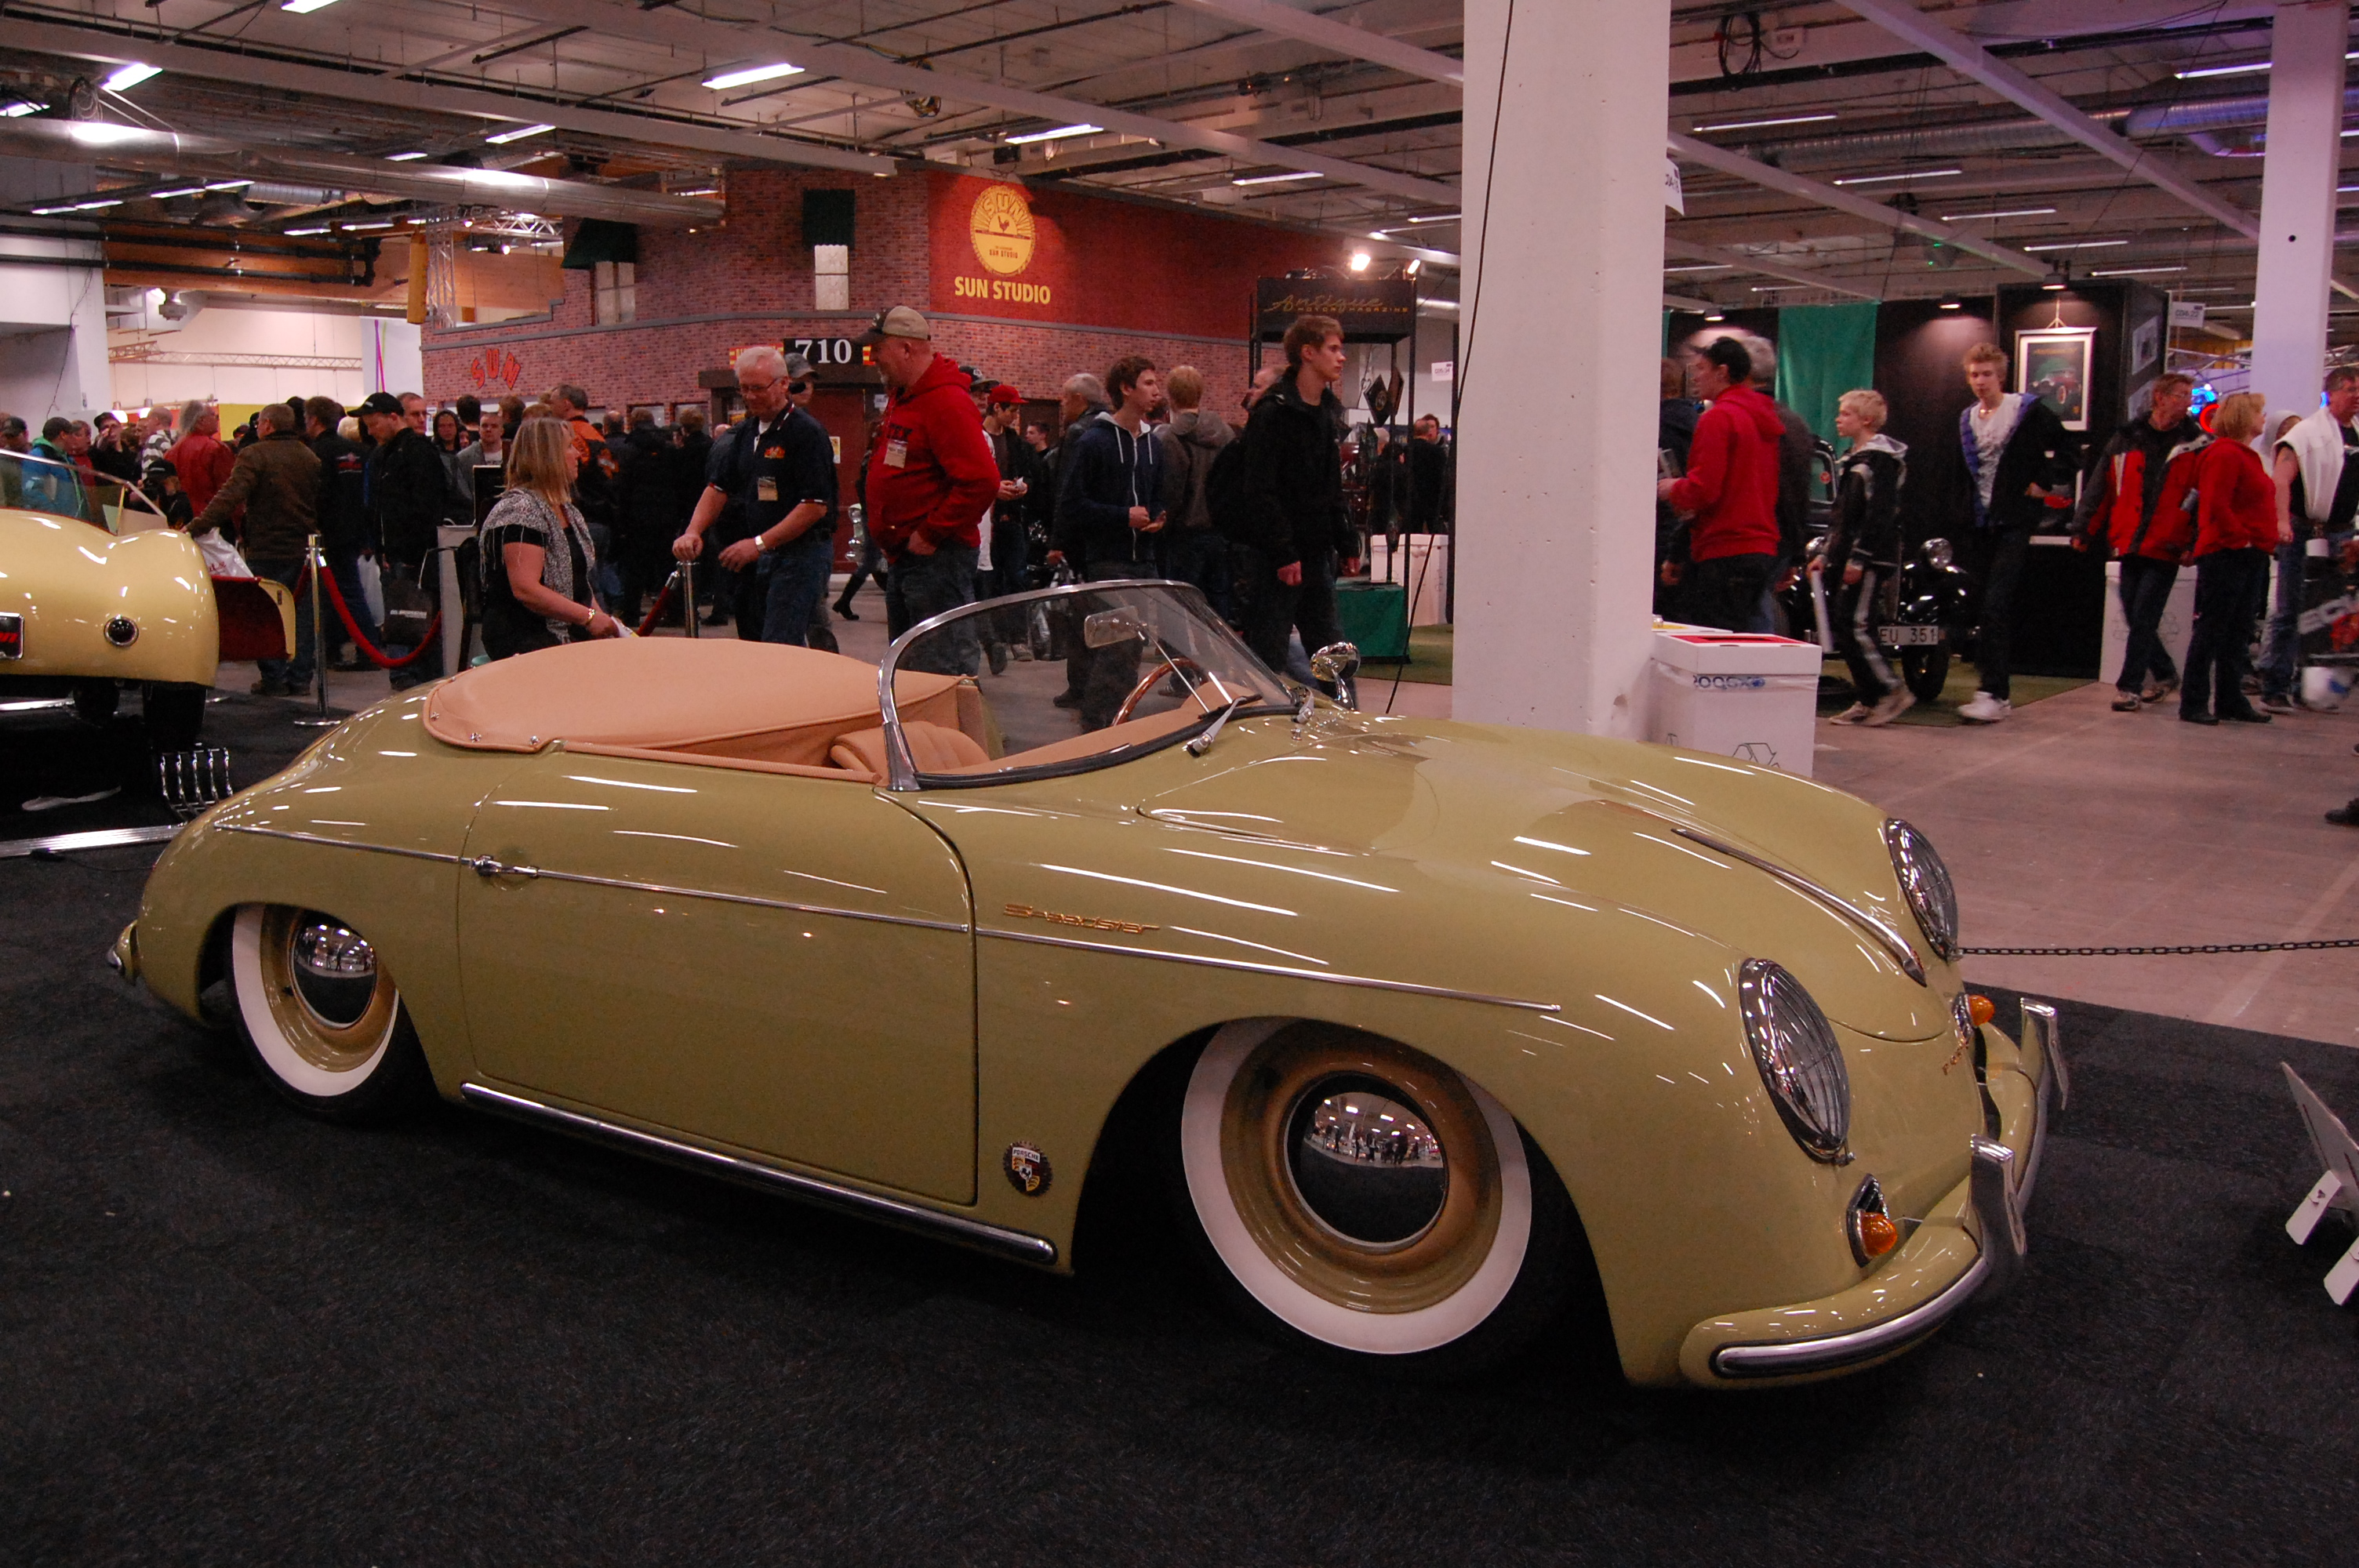 1000 Images About Porsche On Pinterest Porsche 356